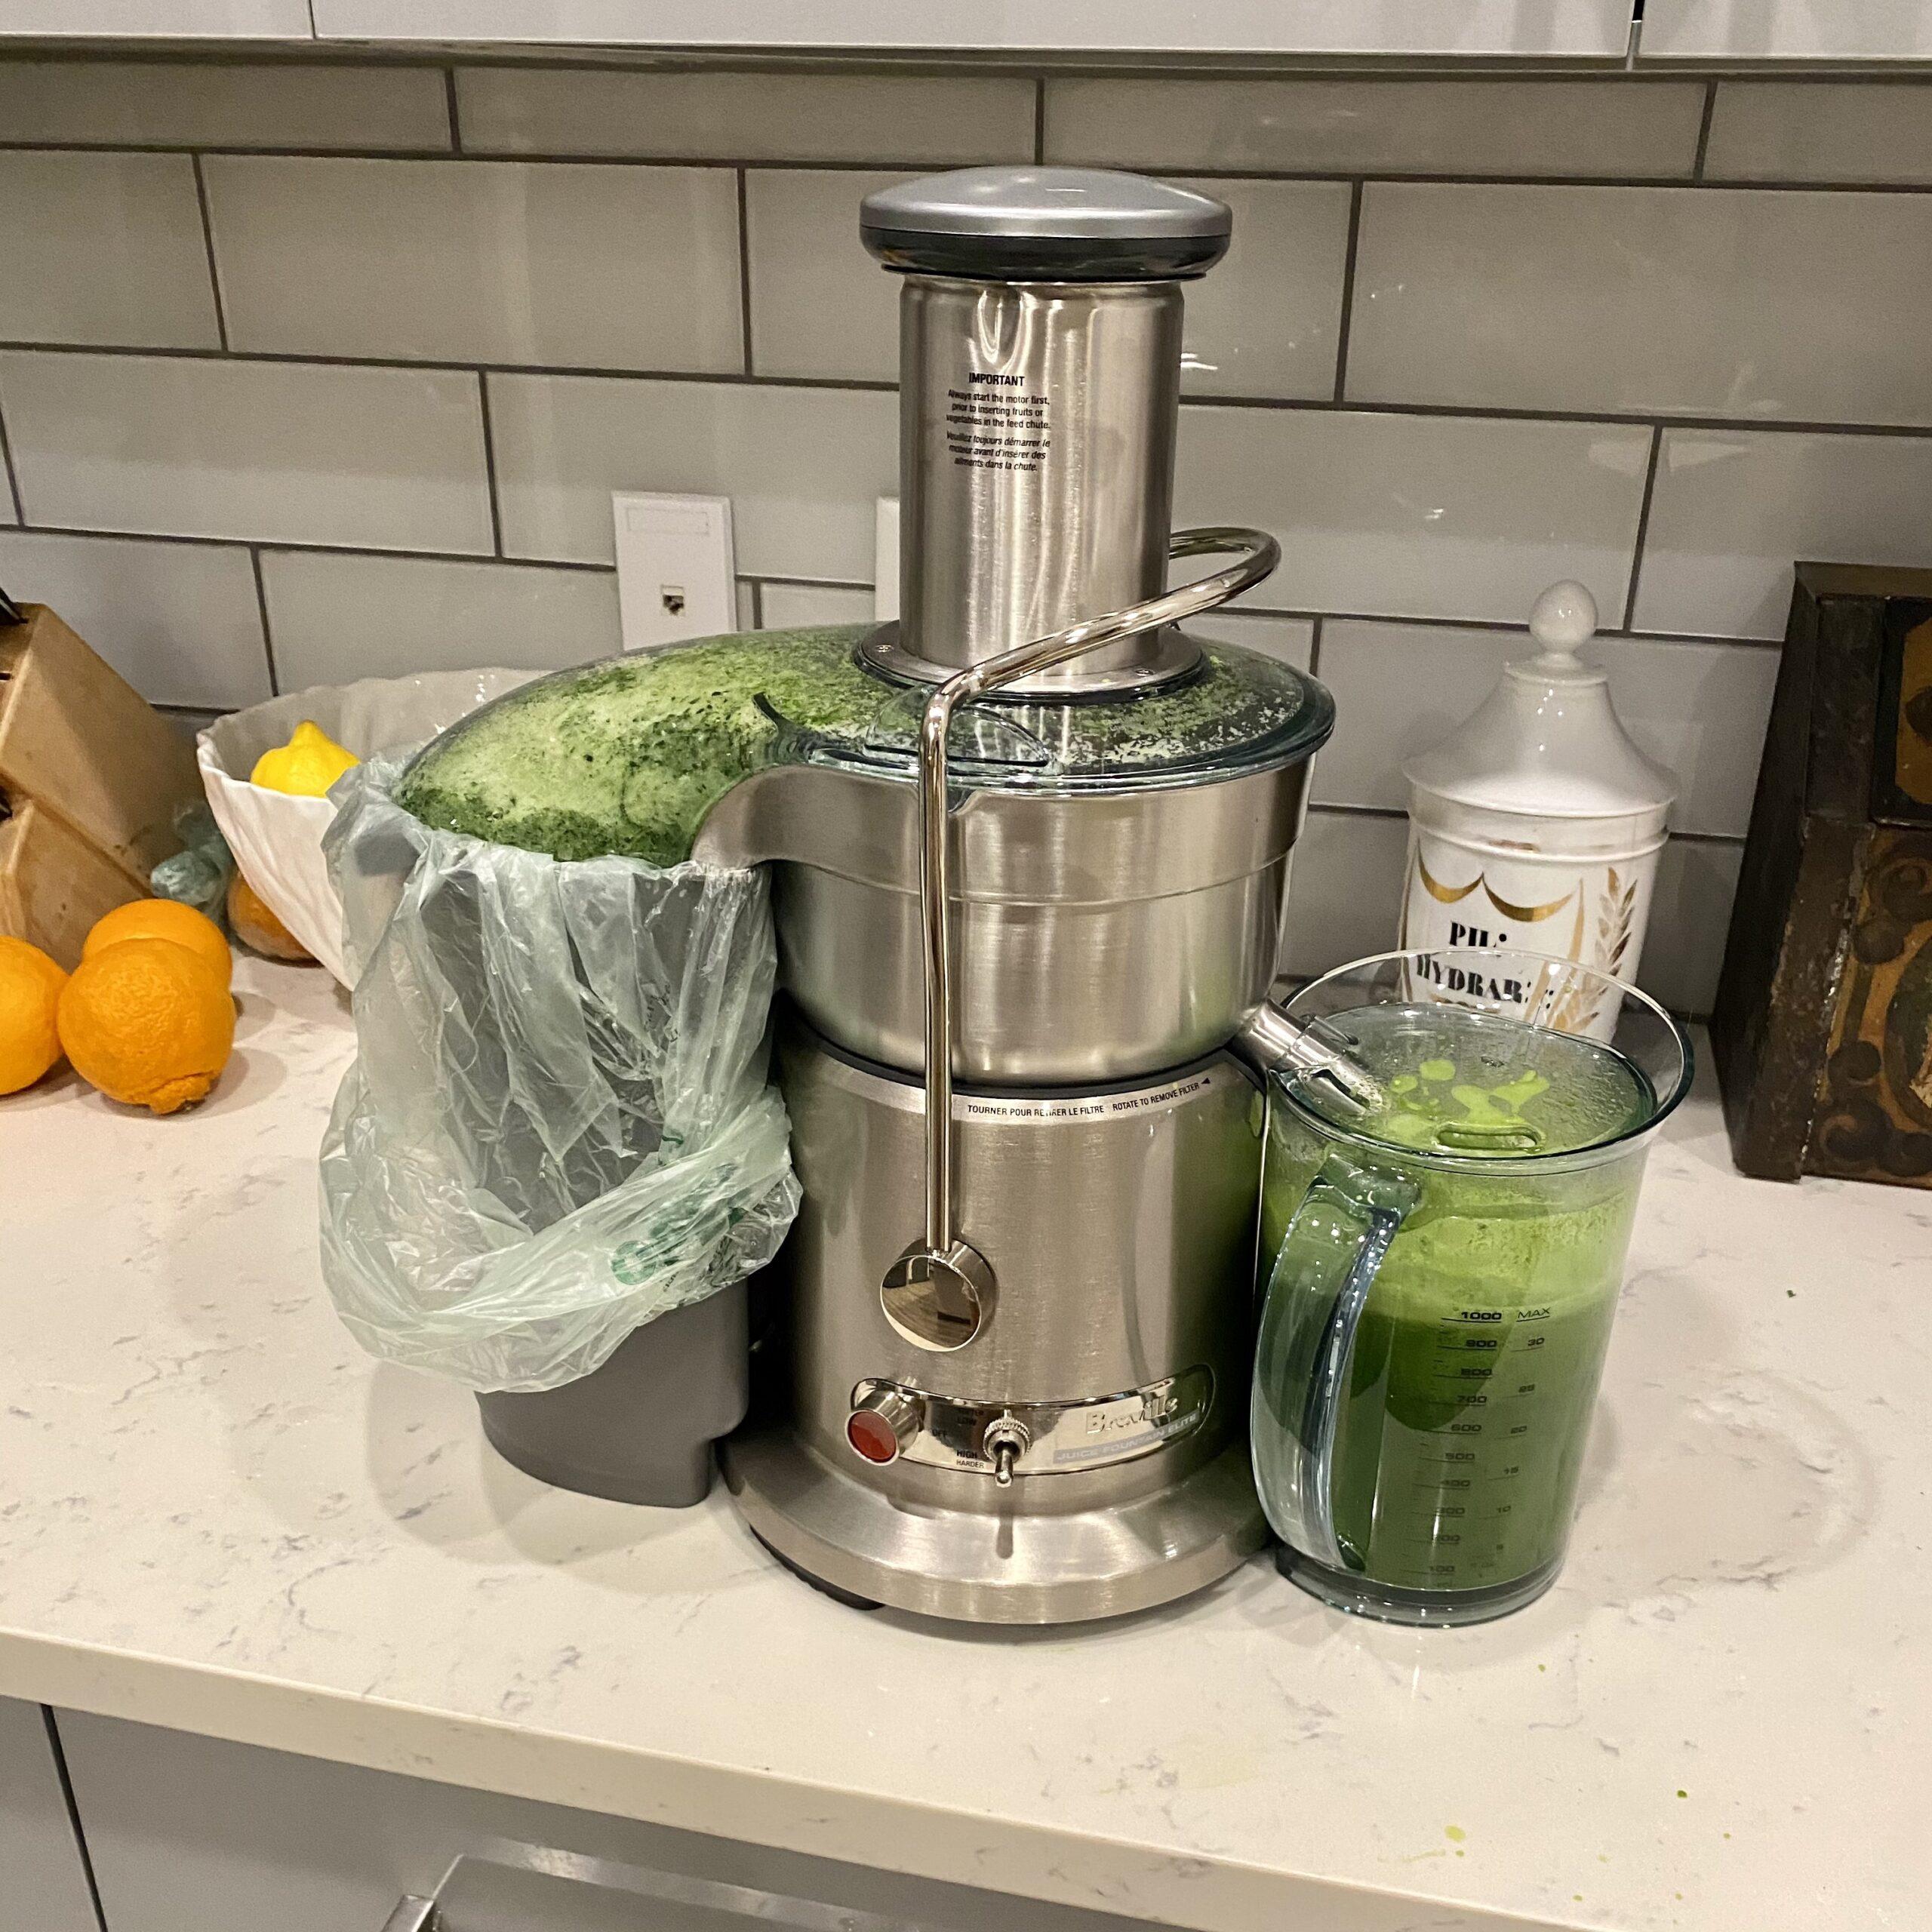 my new juicer